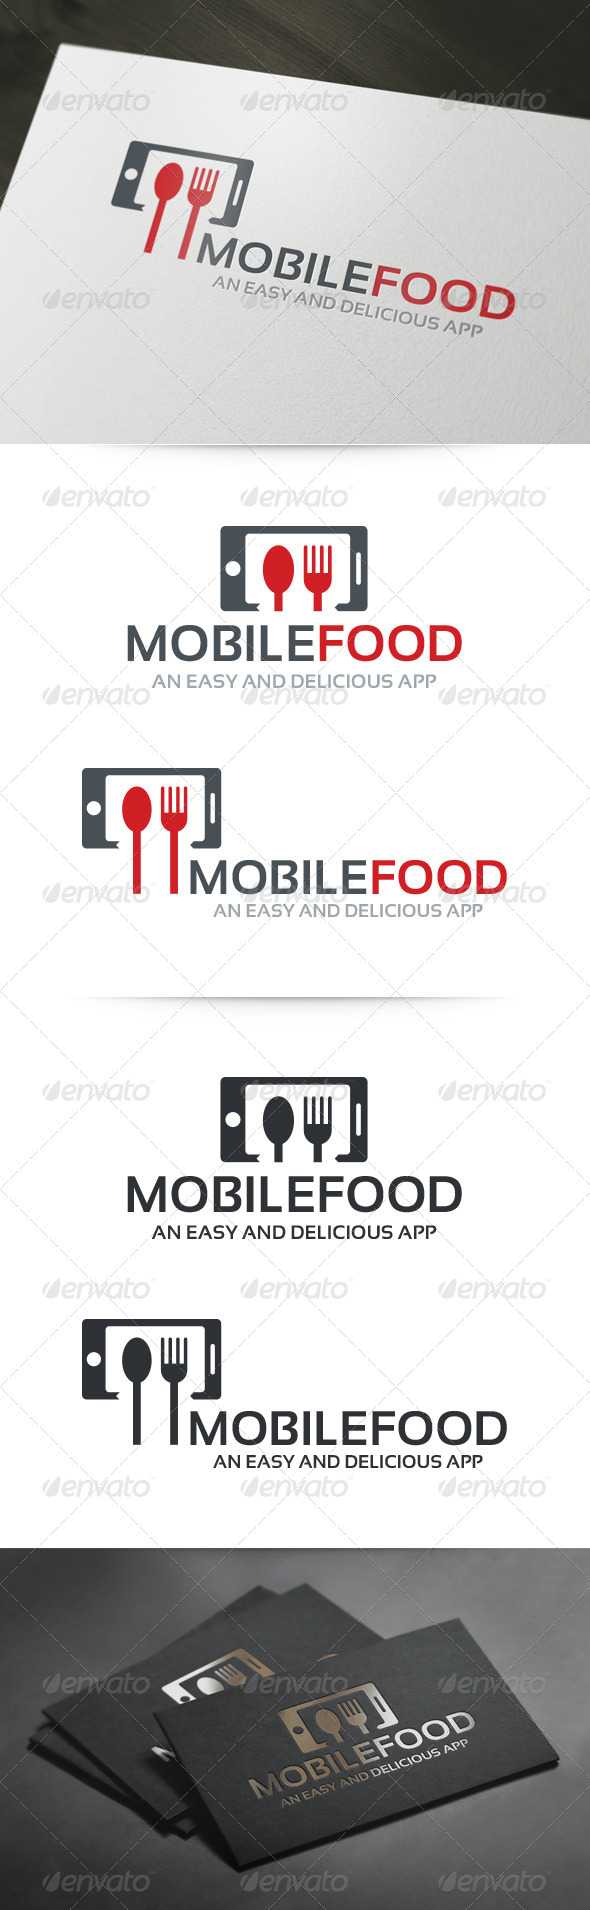 Mobile Food Logo - Food Logo Templates